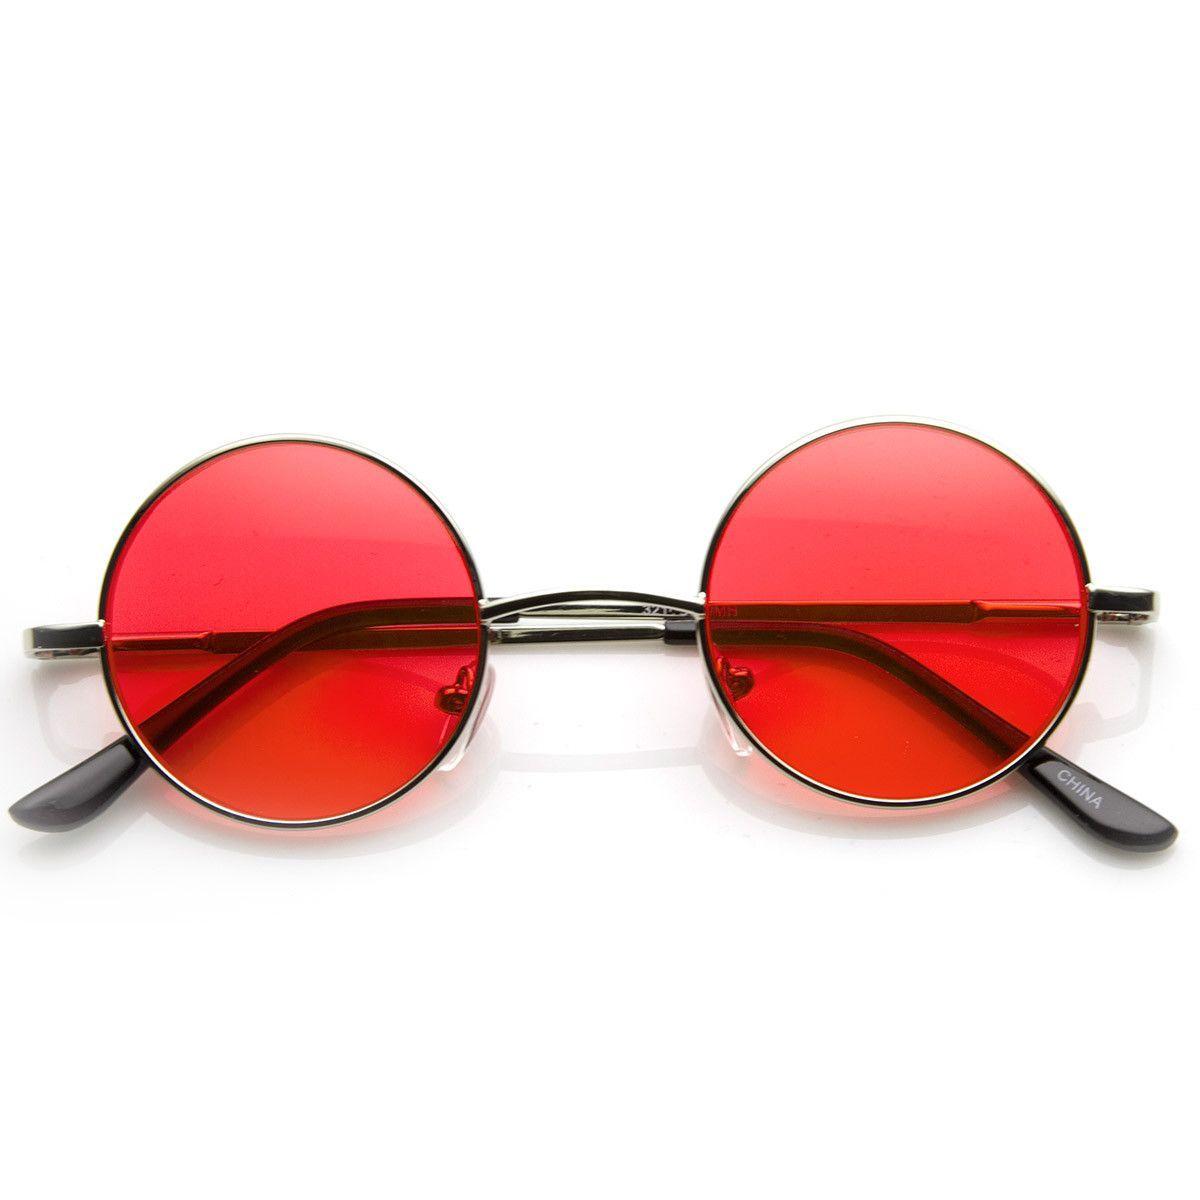 5b8cddffba Red Circle Lens Glasses, Circle Sunglasses, Circle Lenses, Round  Sunglasses, Ozzy Osbourne